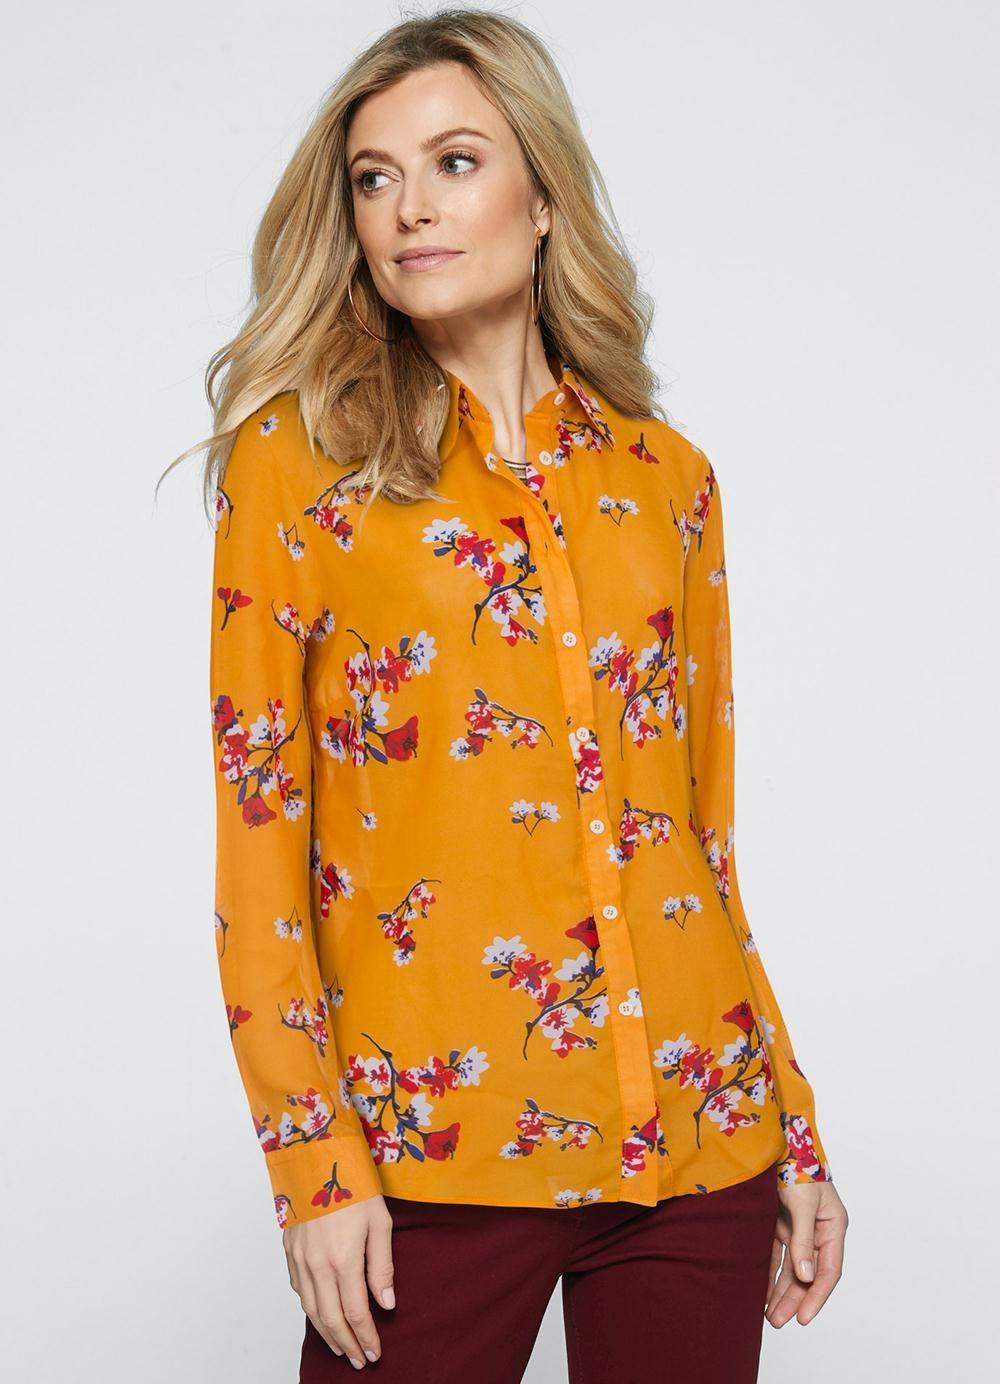 faf7018e71 Camisa Estampada Floral Laranja - bonprix